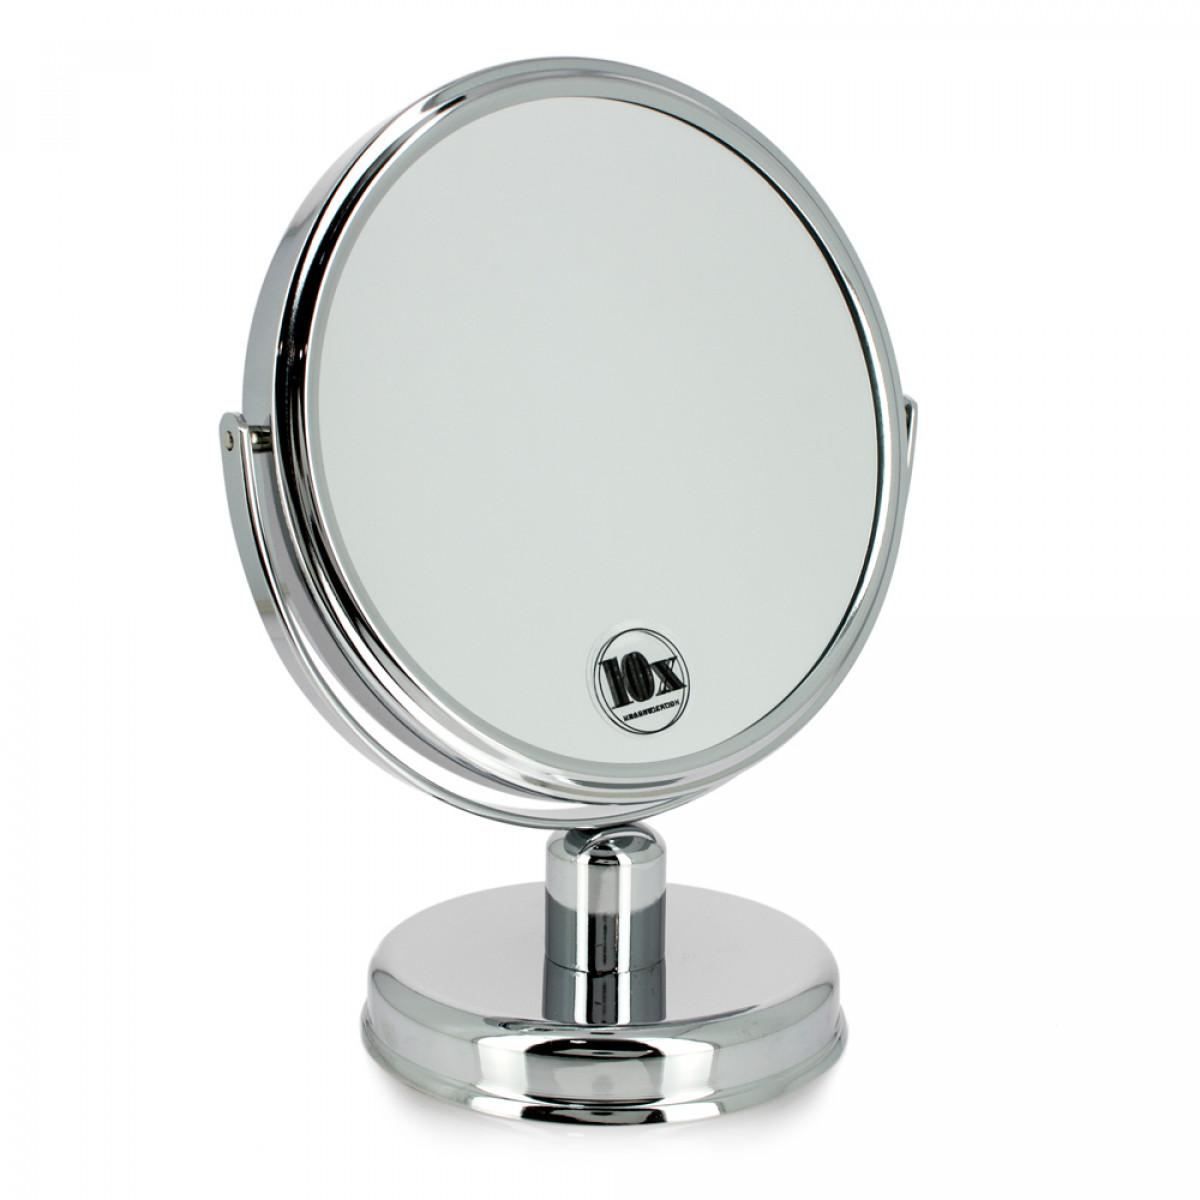 Miroir double face grossissant x10 altesse gouiran beaut particulier for Miroir grossissant x10